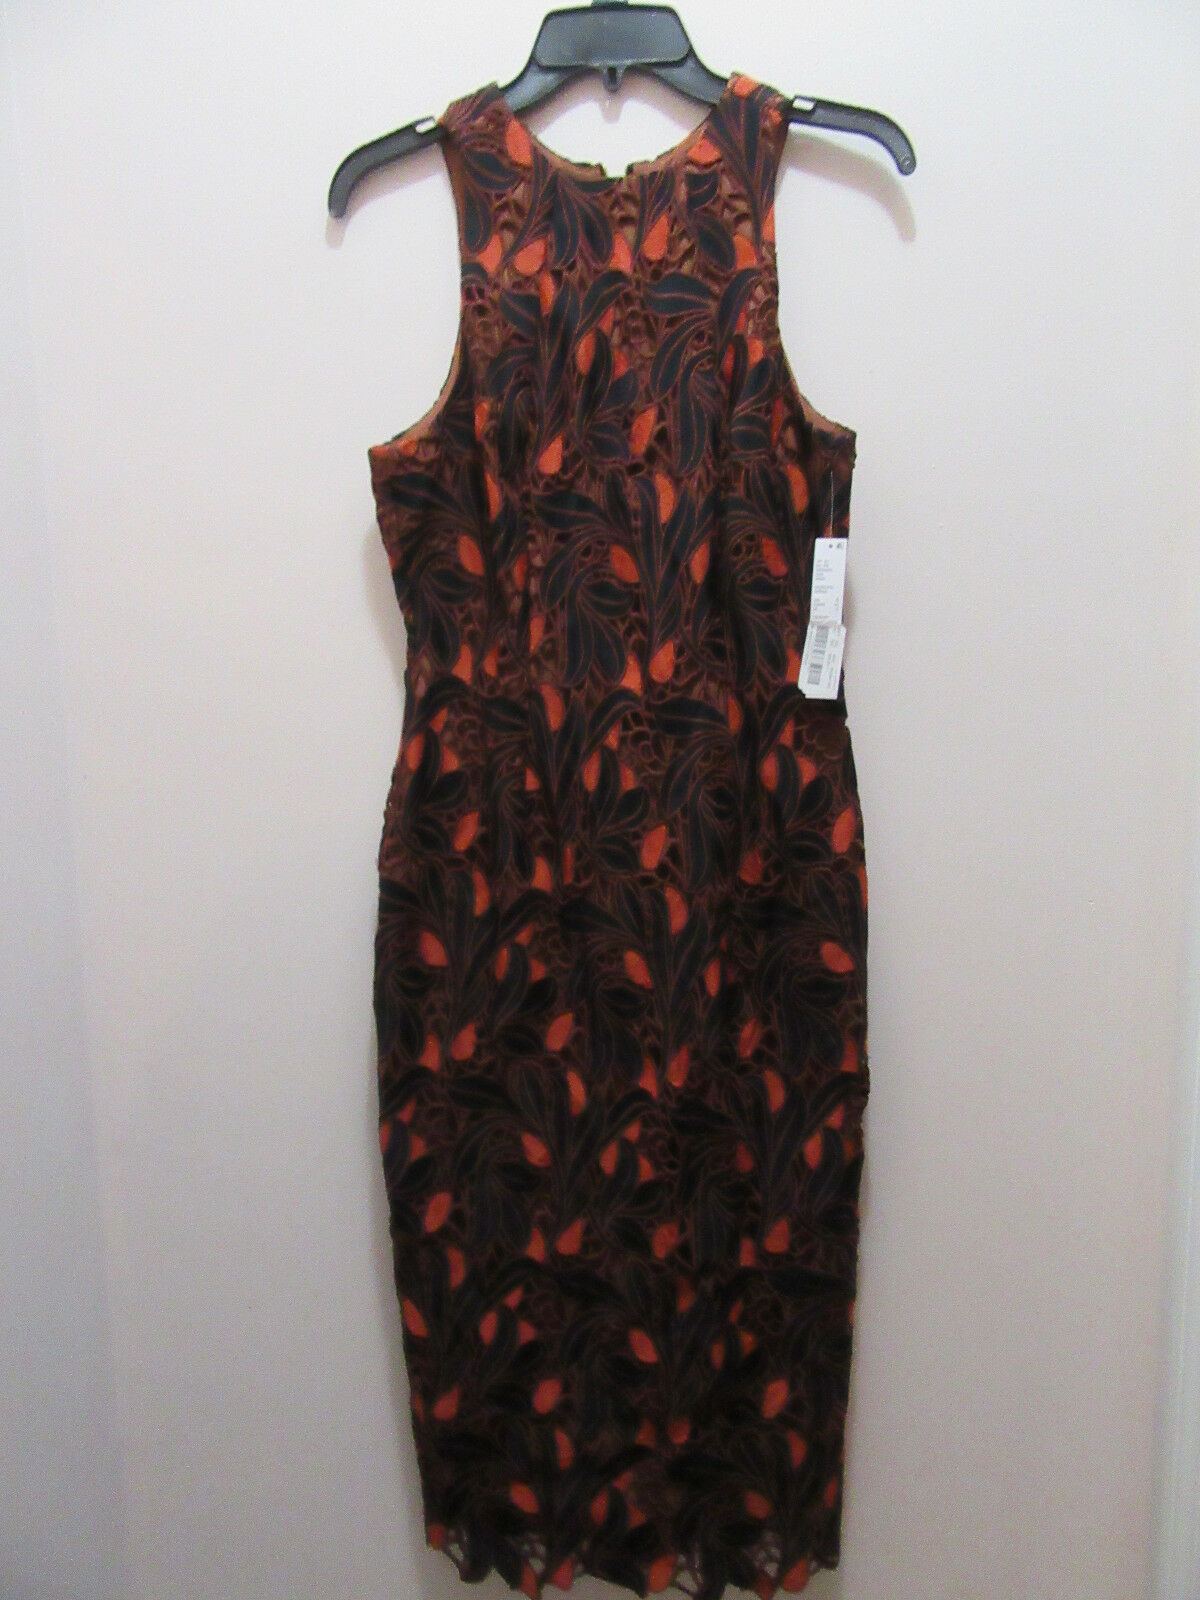 055d44a8ed ANTONIO MELANI SAGE DRESS . SIZE SIZE SIZE 6 be6b9f - dressstore ...